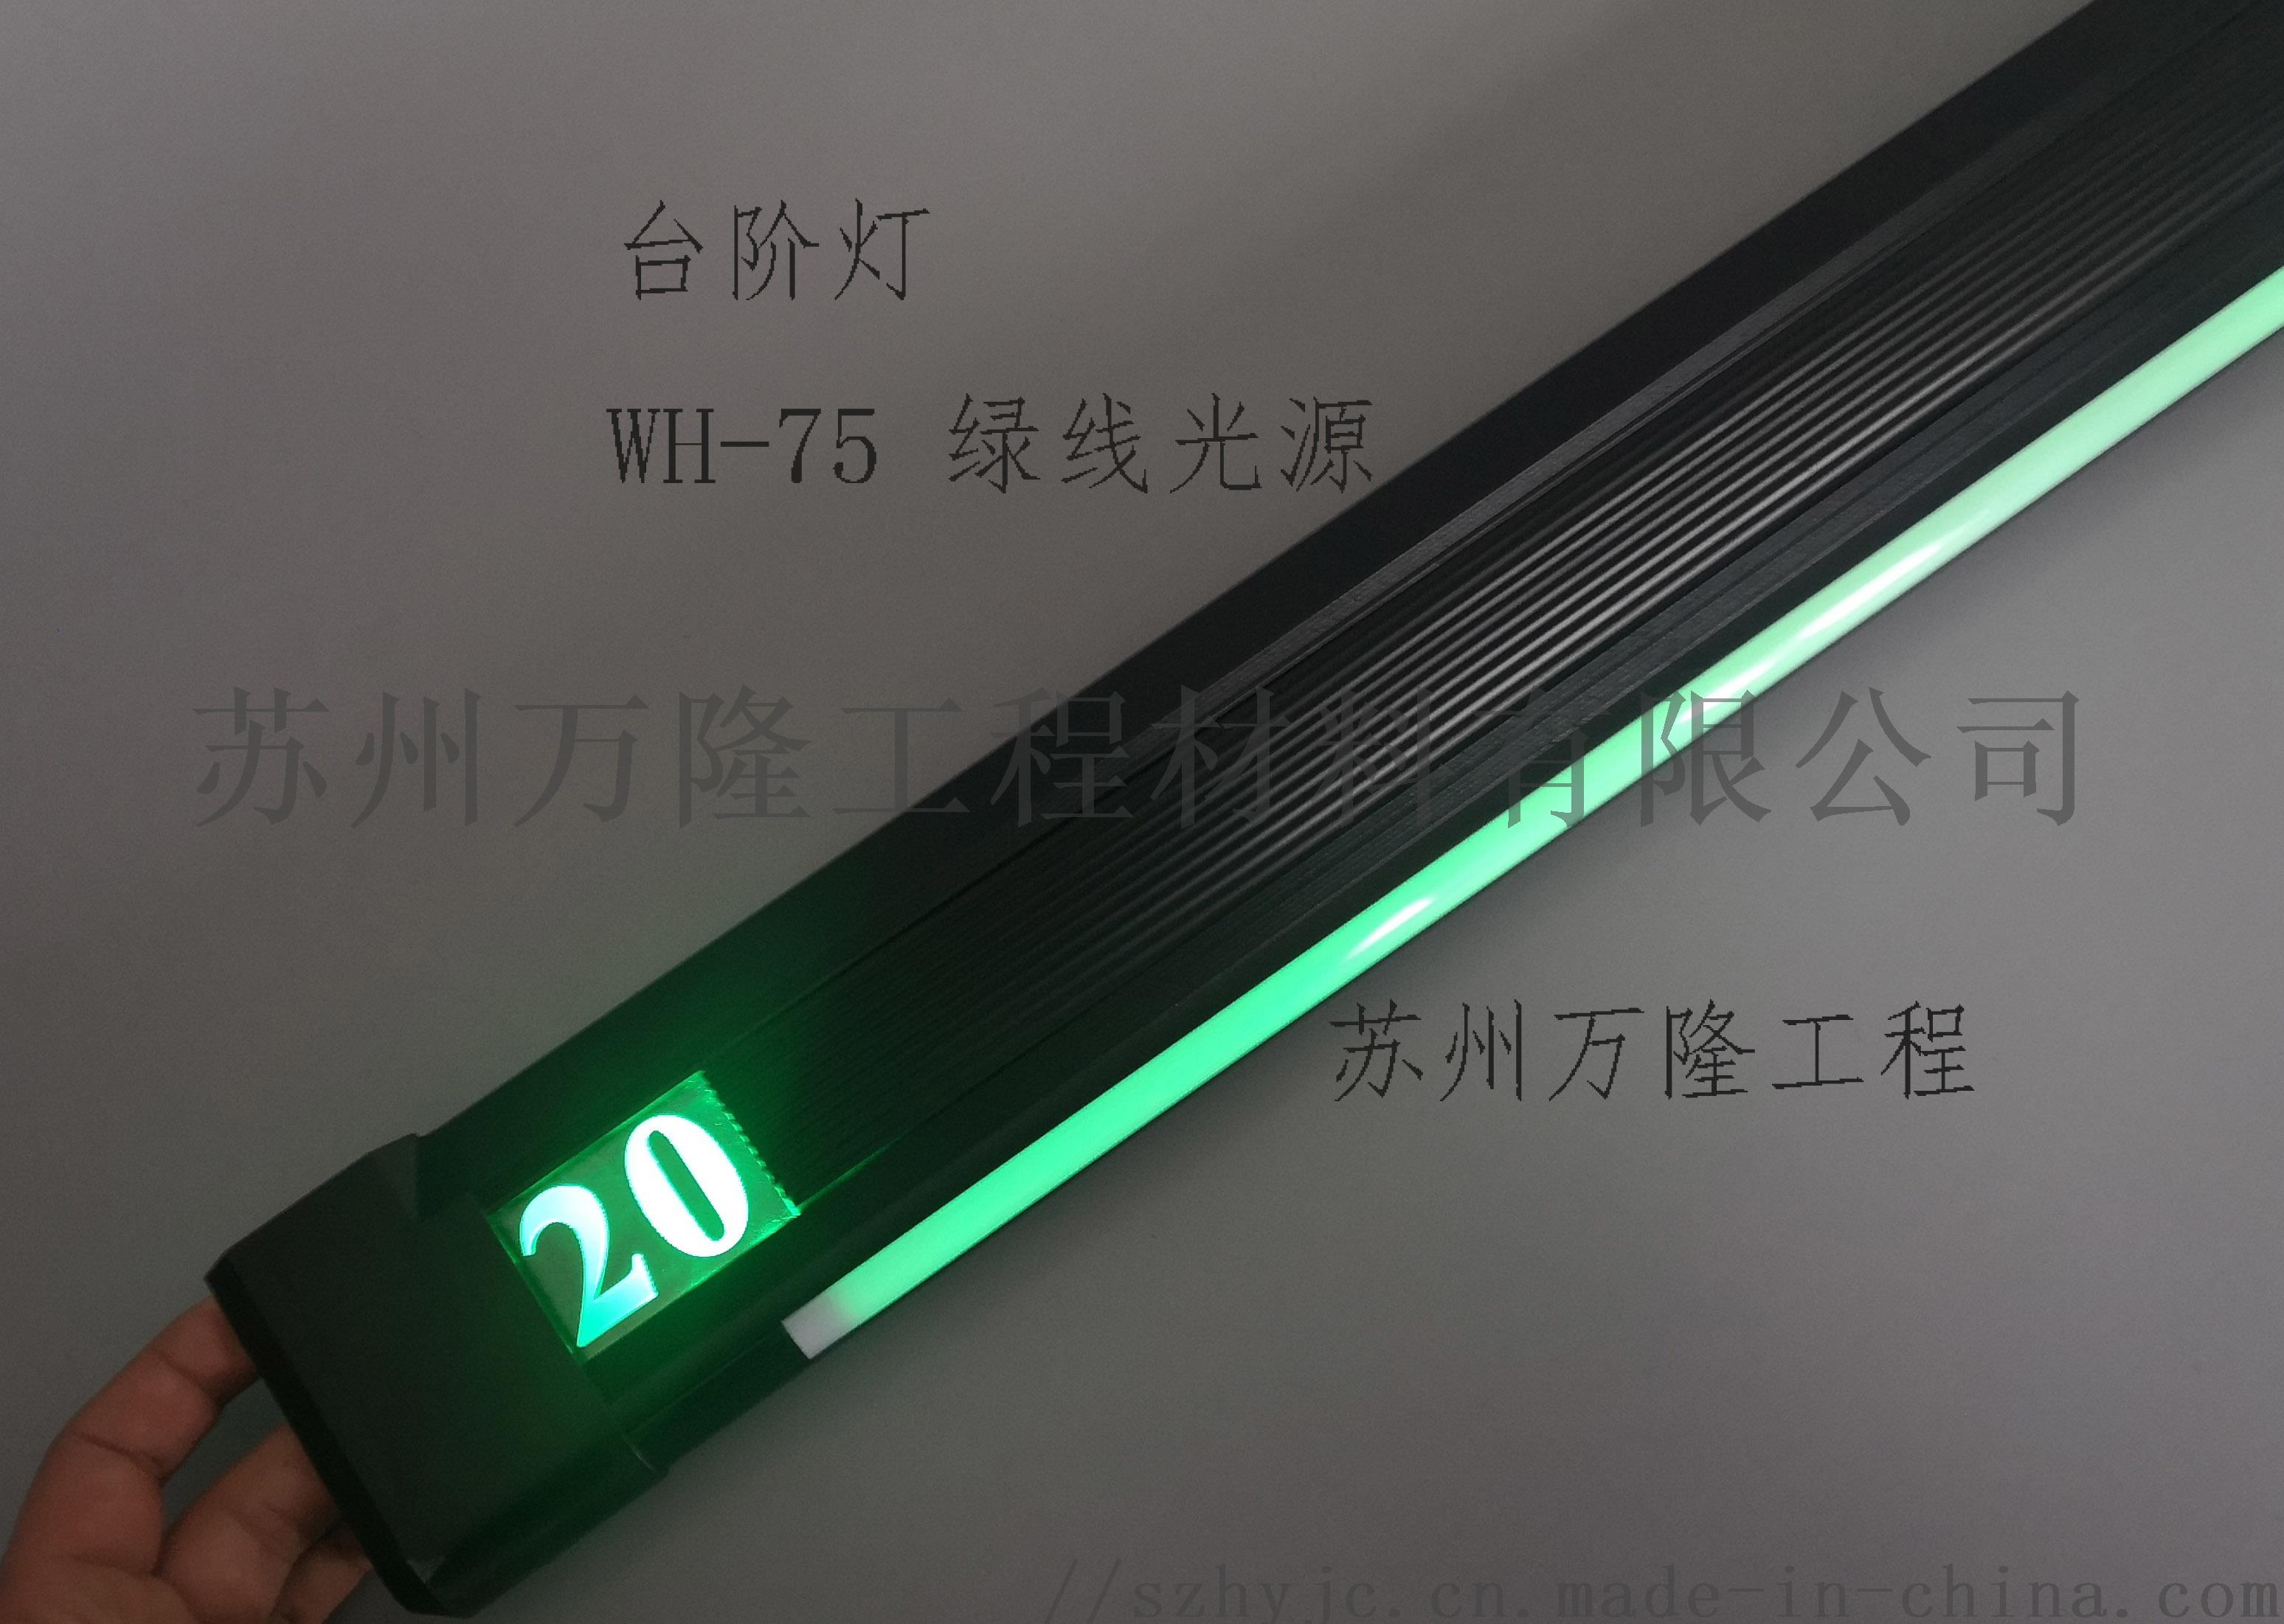 WH-75绿色线光源.jpg